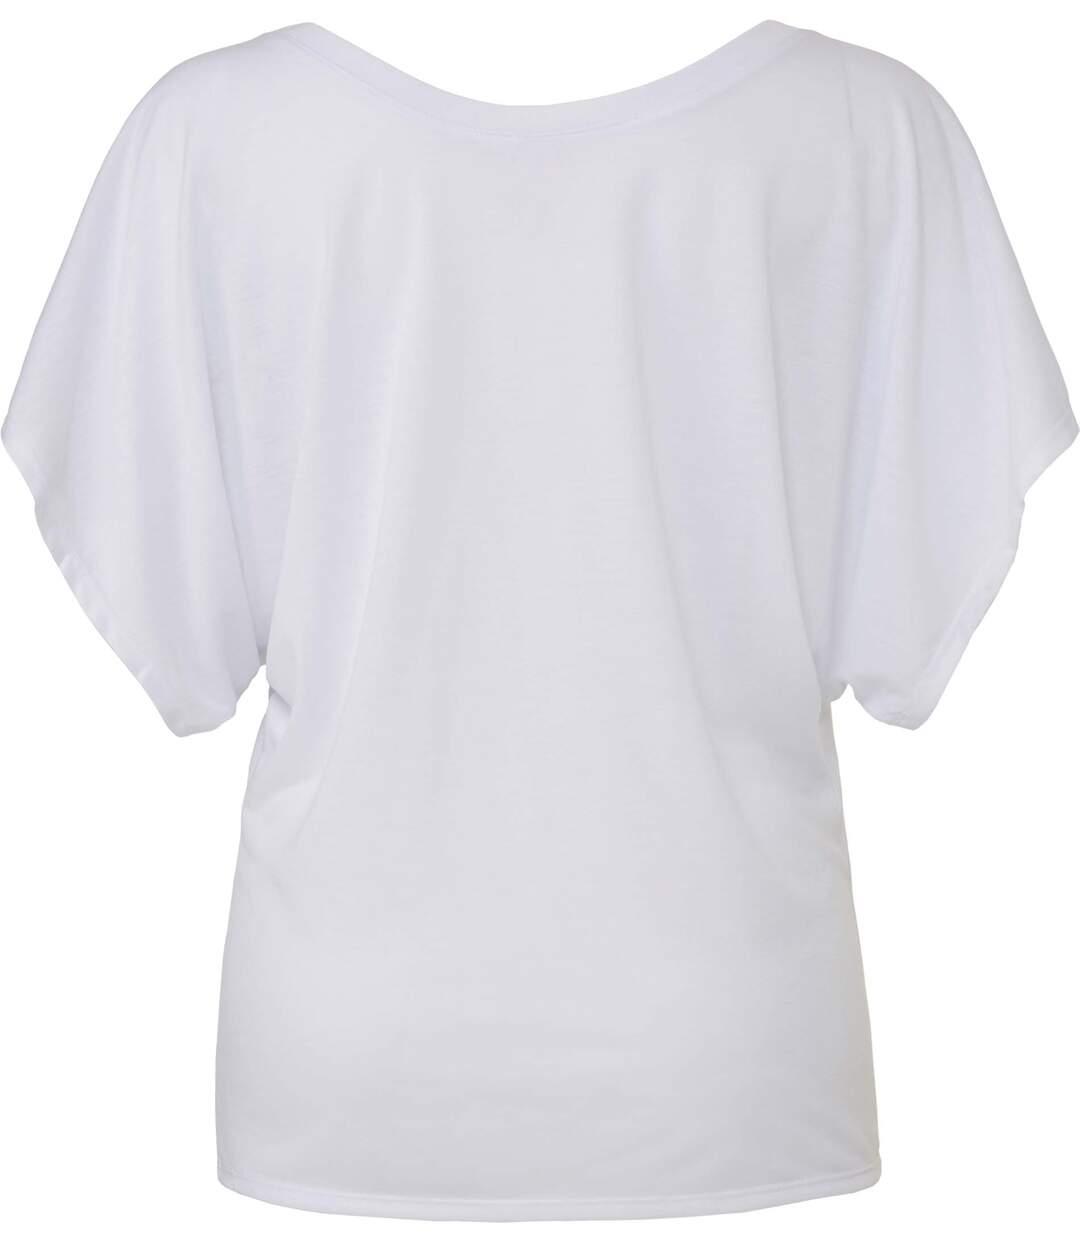 T-shirt fluide col rond